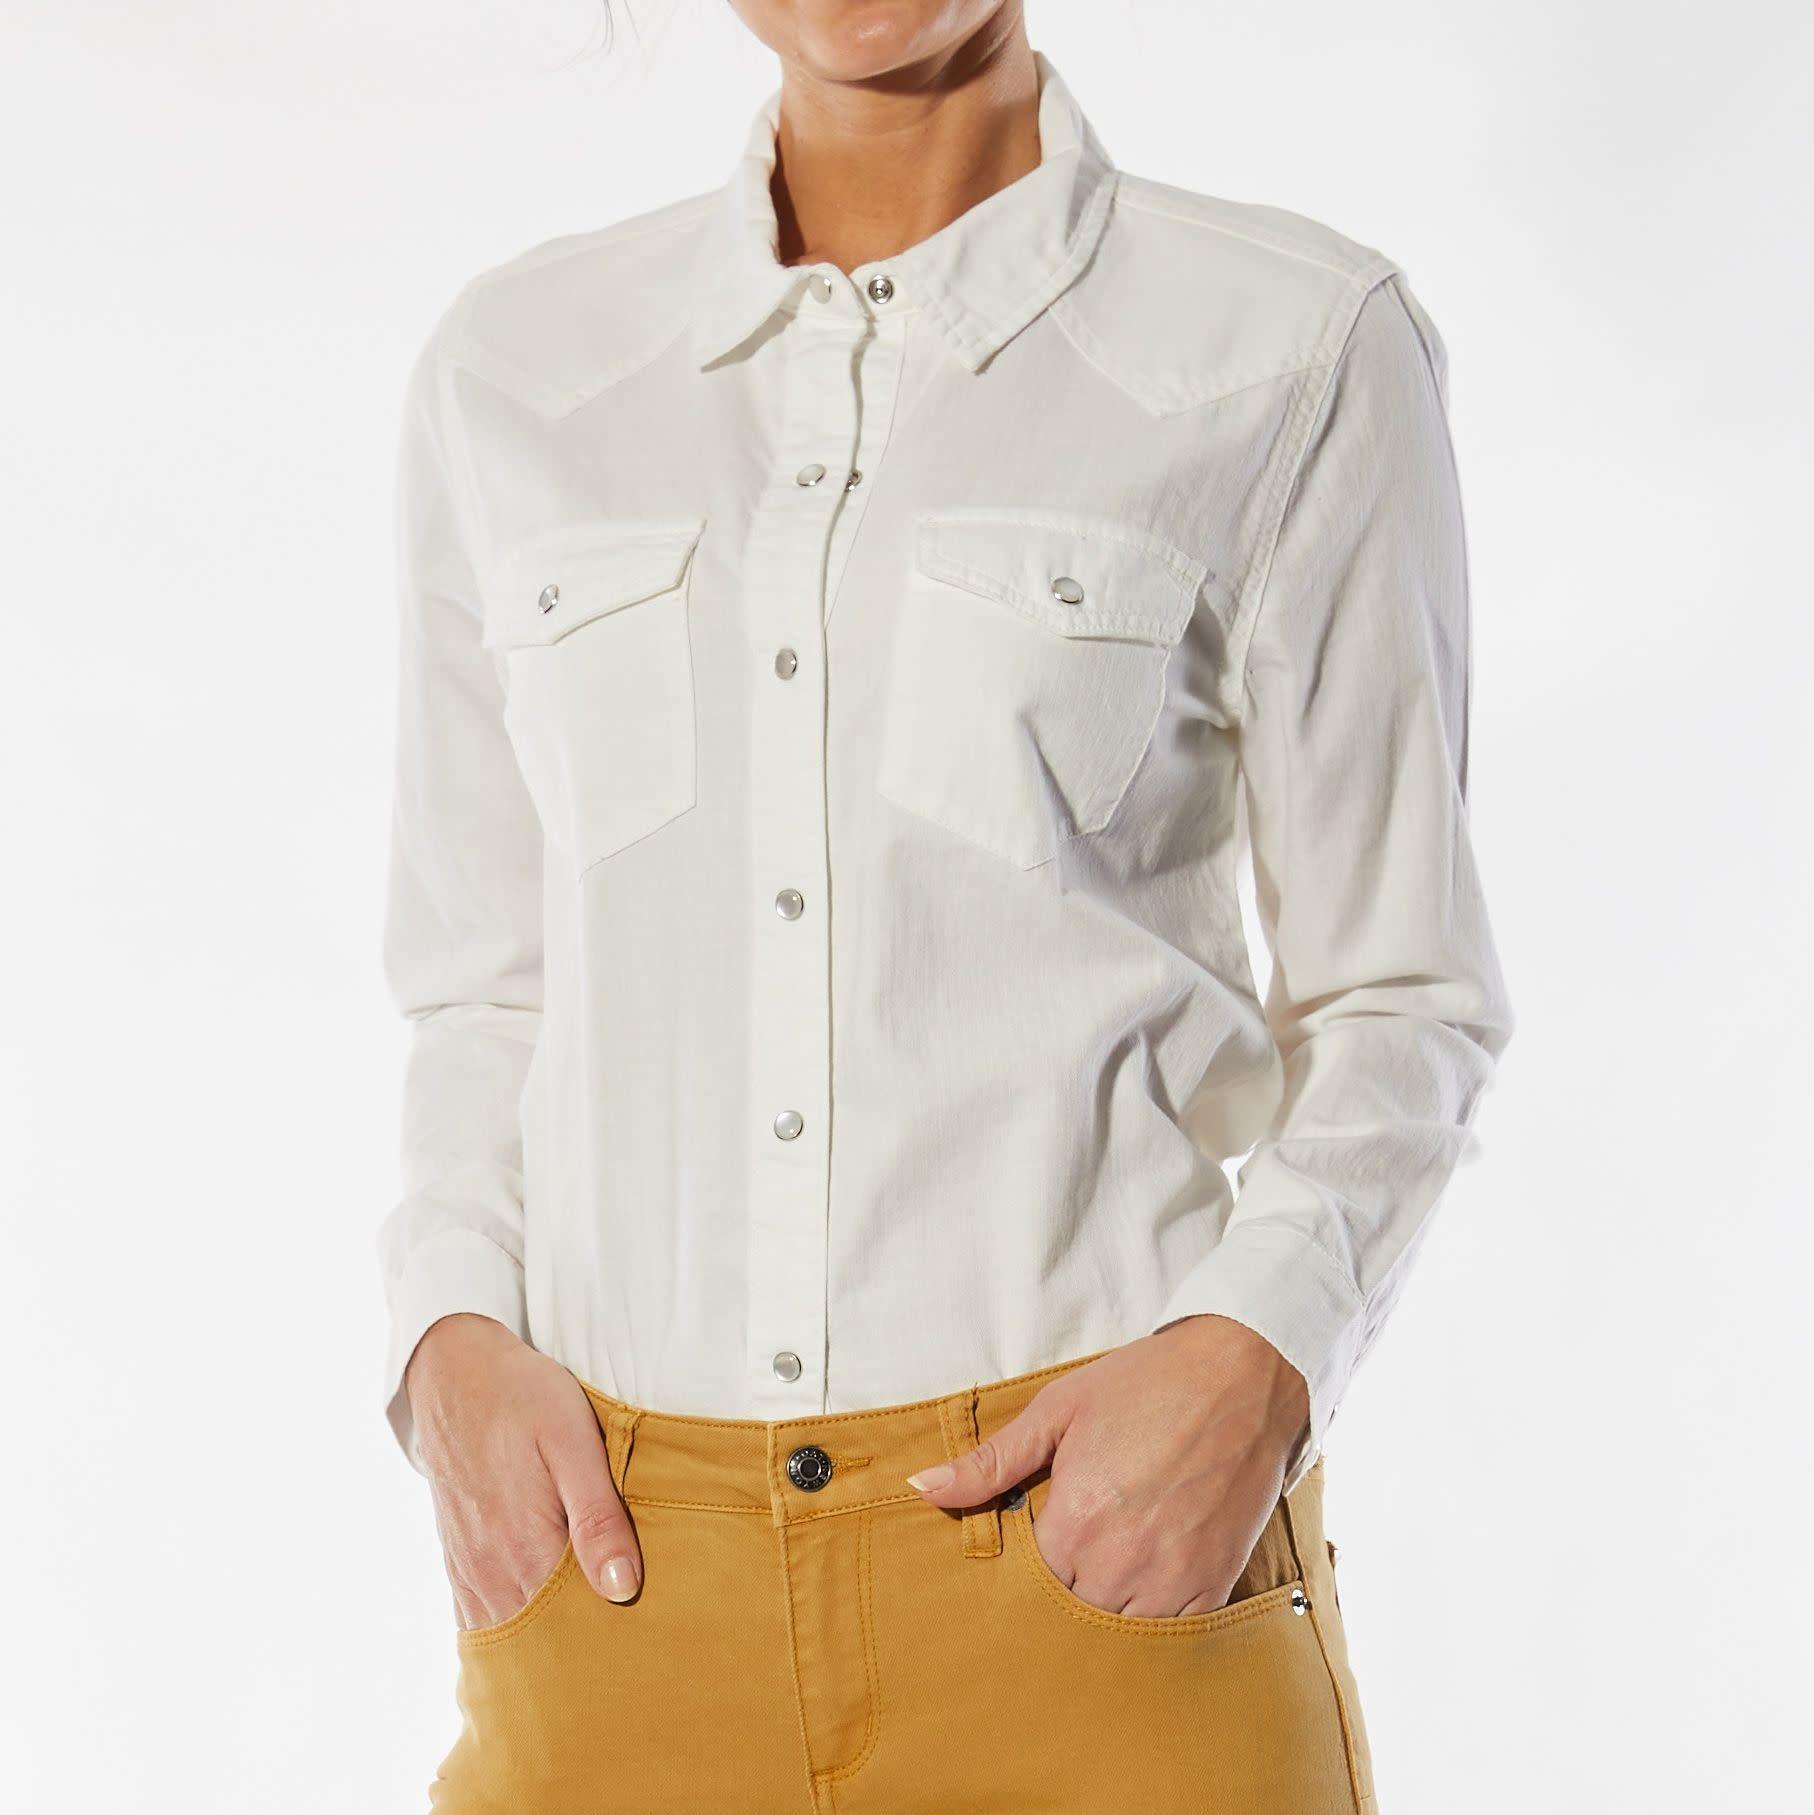 Western Style Shirt